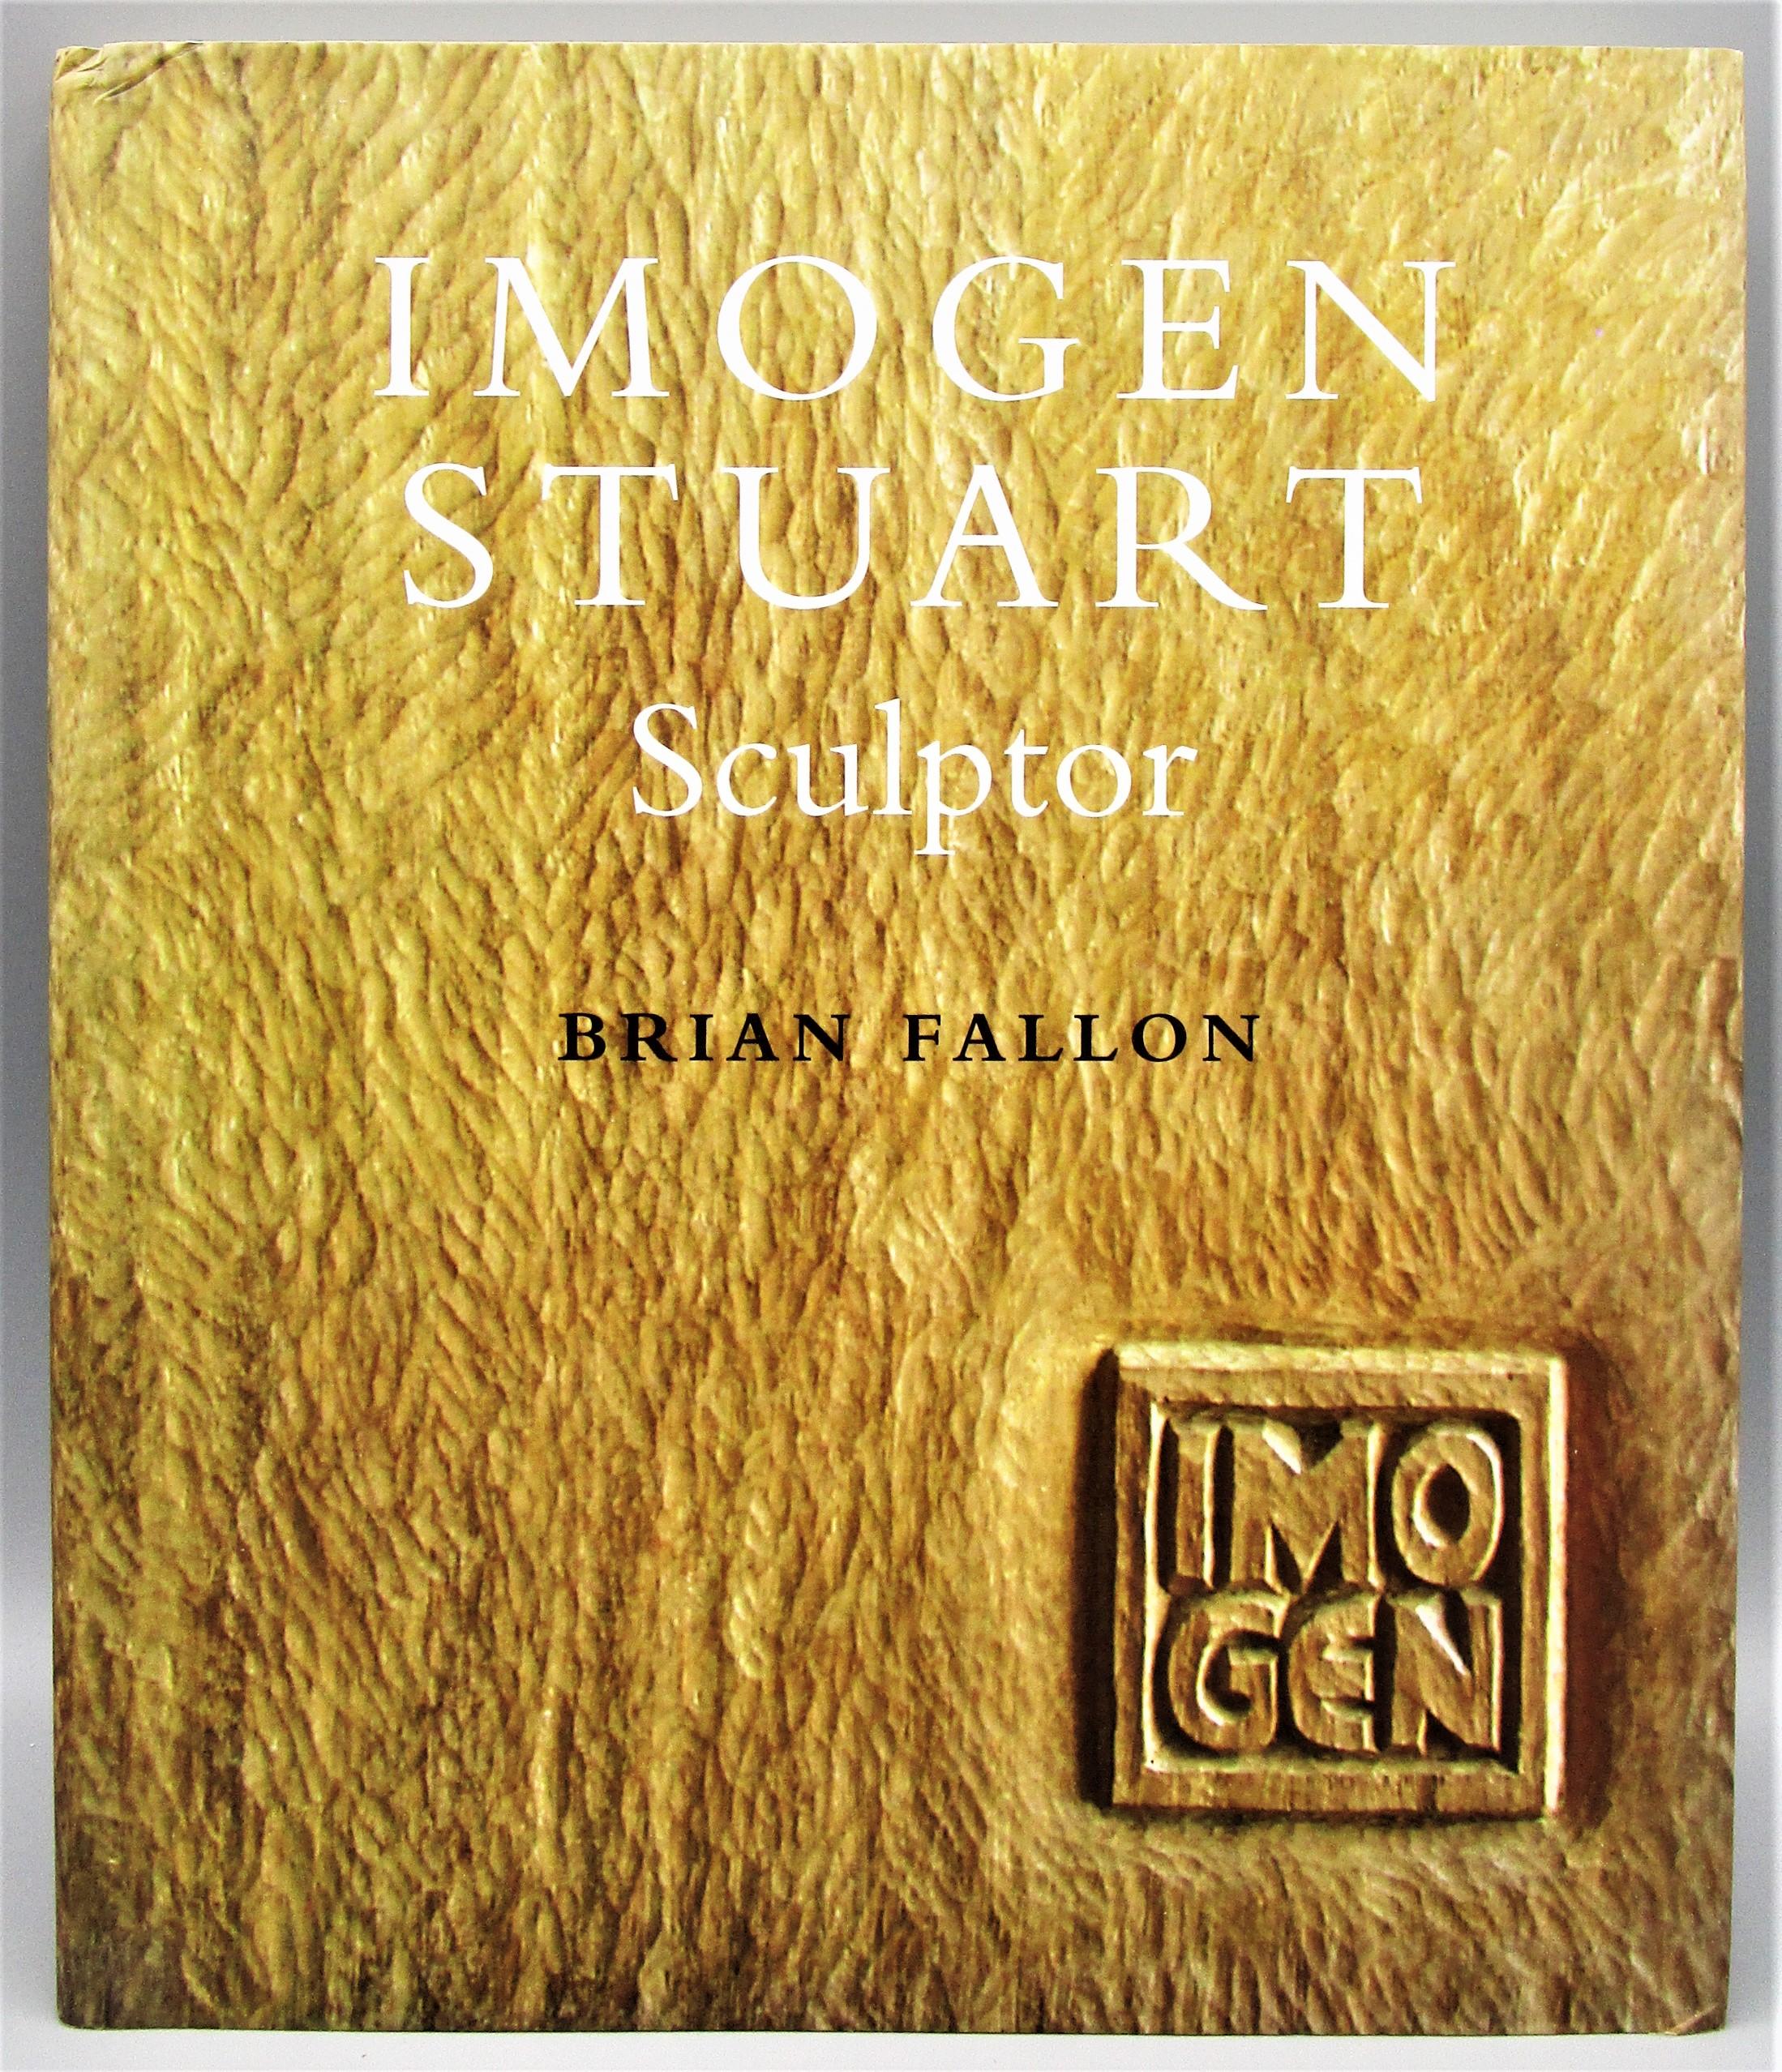 IMOGEN STUART: SCULPTOR, by Brian Fallon - 2002